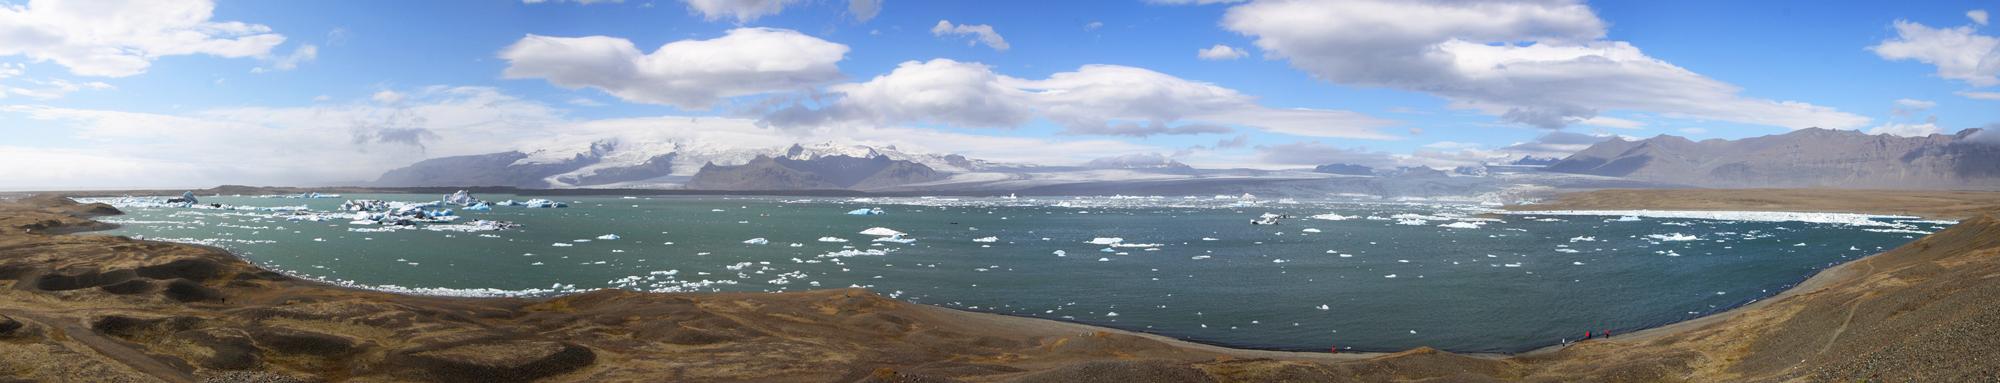 Lagon de Jökulsárlón, Islande